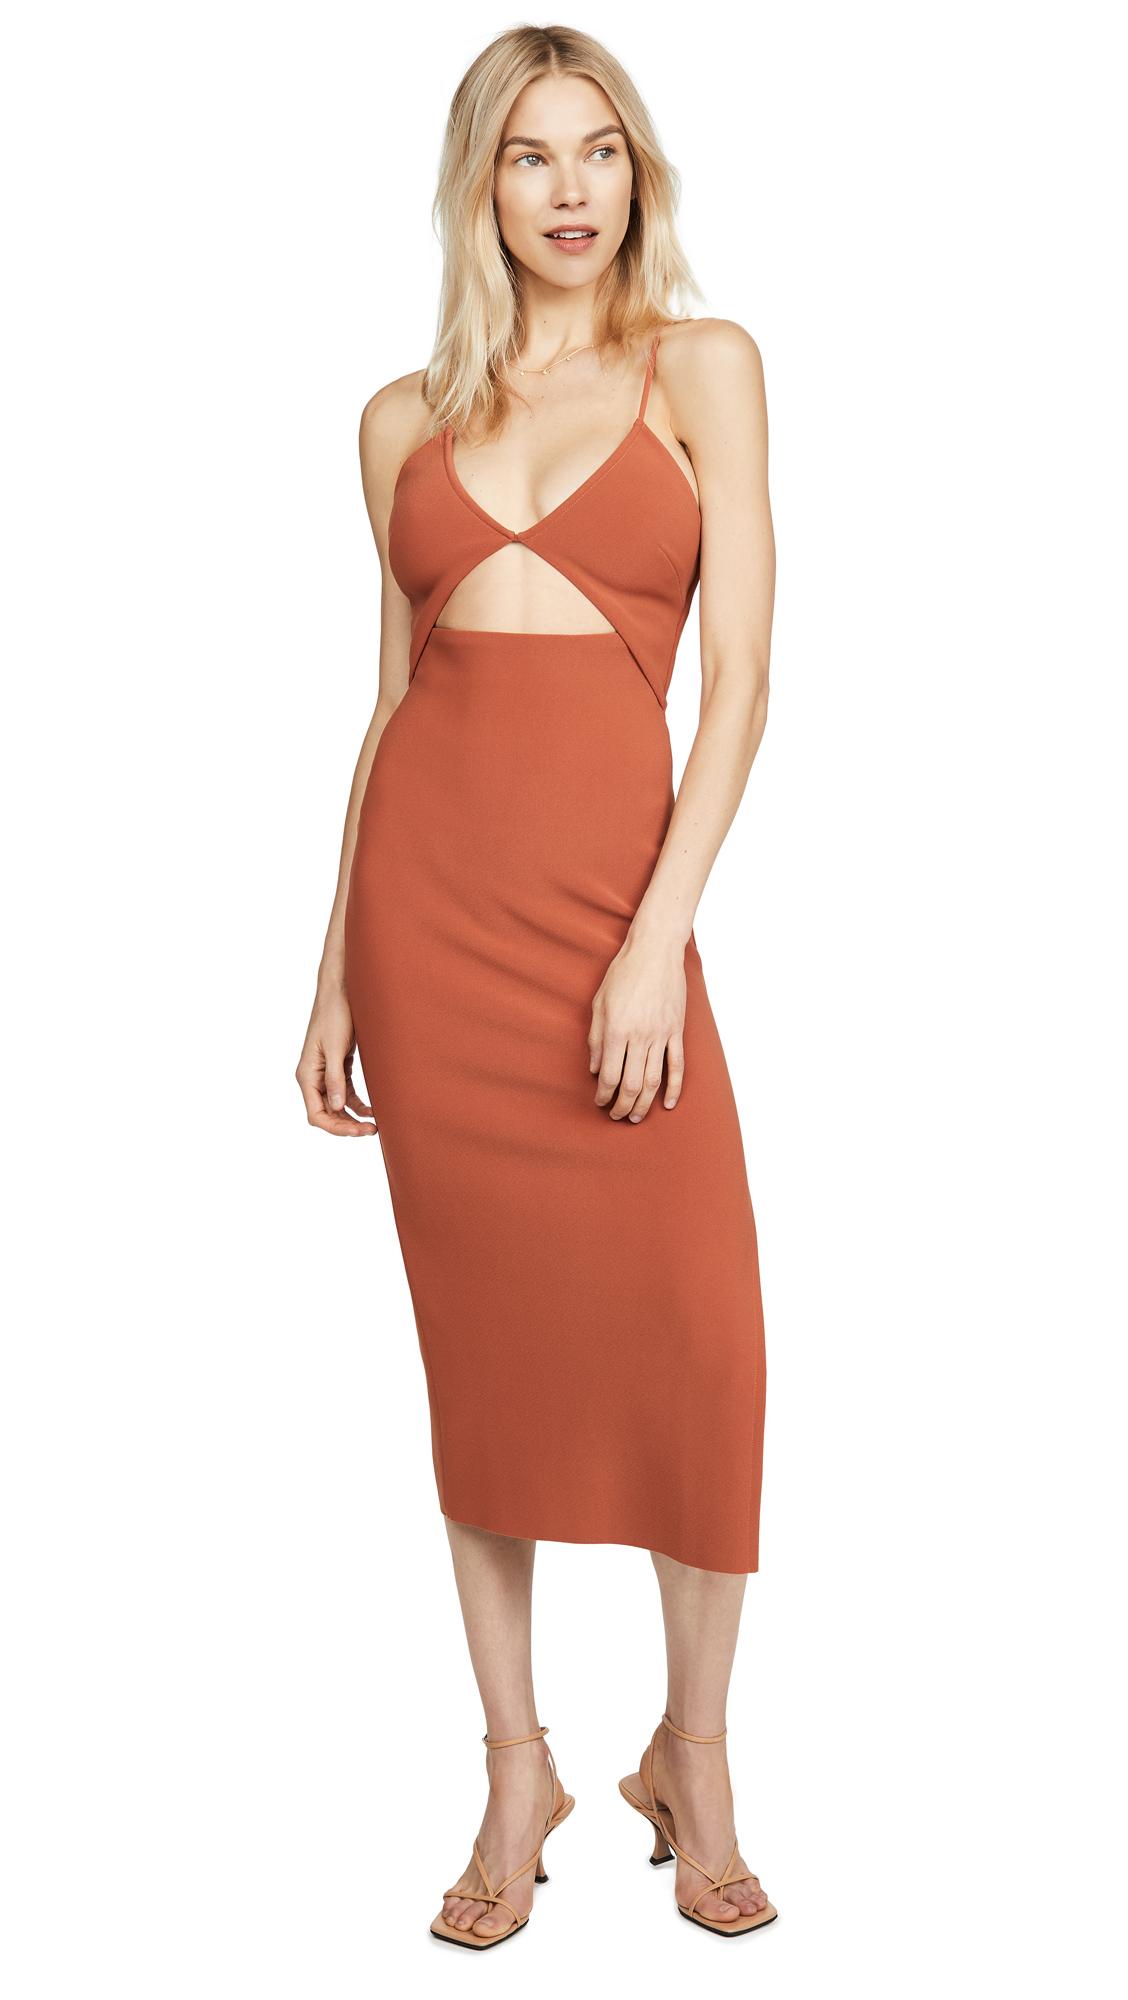 Bec & Bridge Ruby Midi Dress - 40% Off Sale